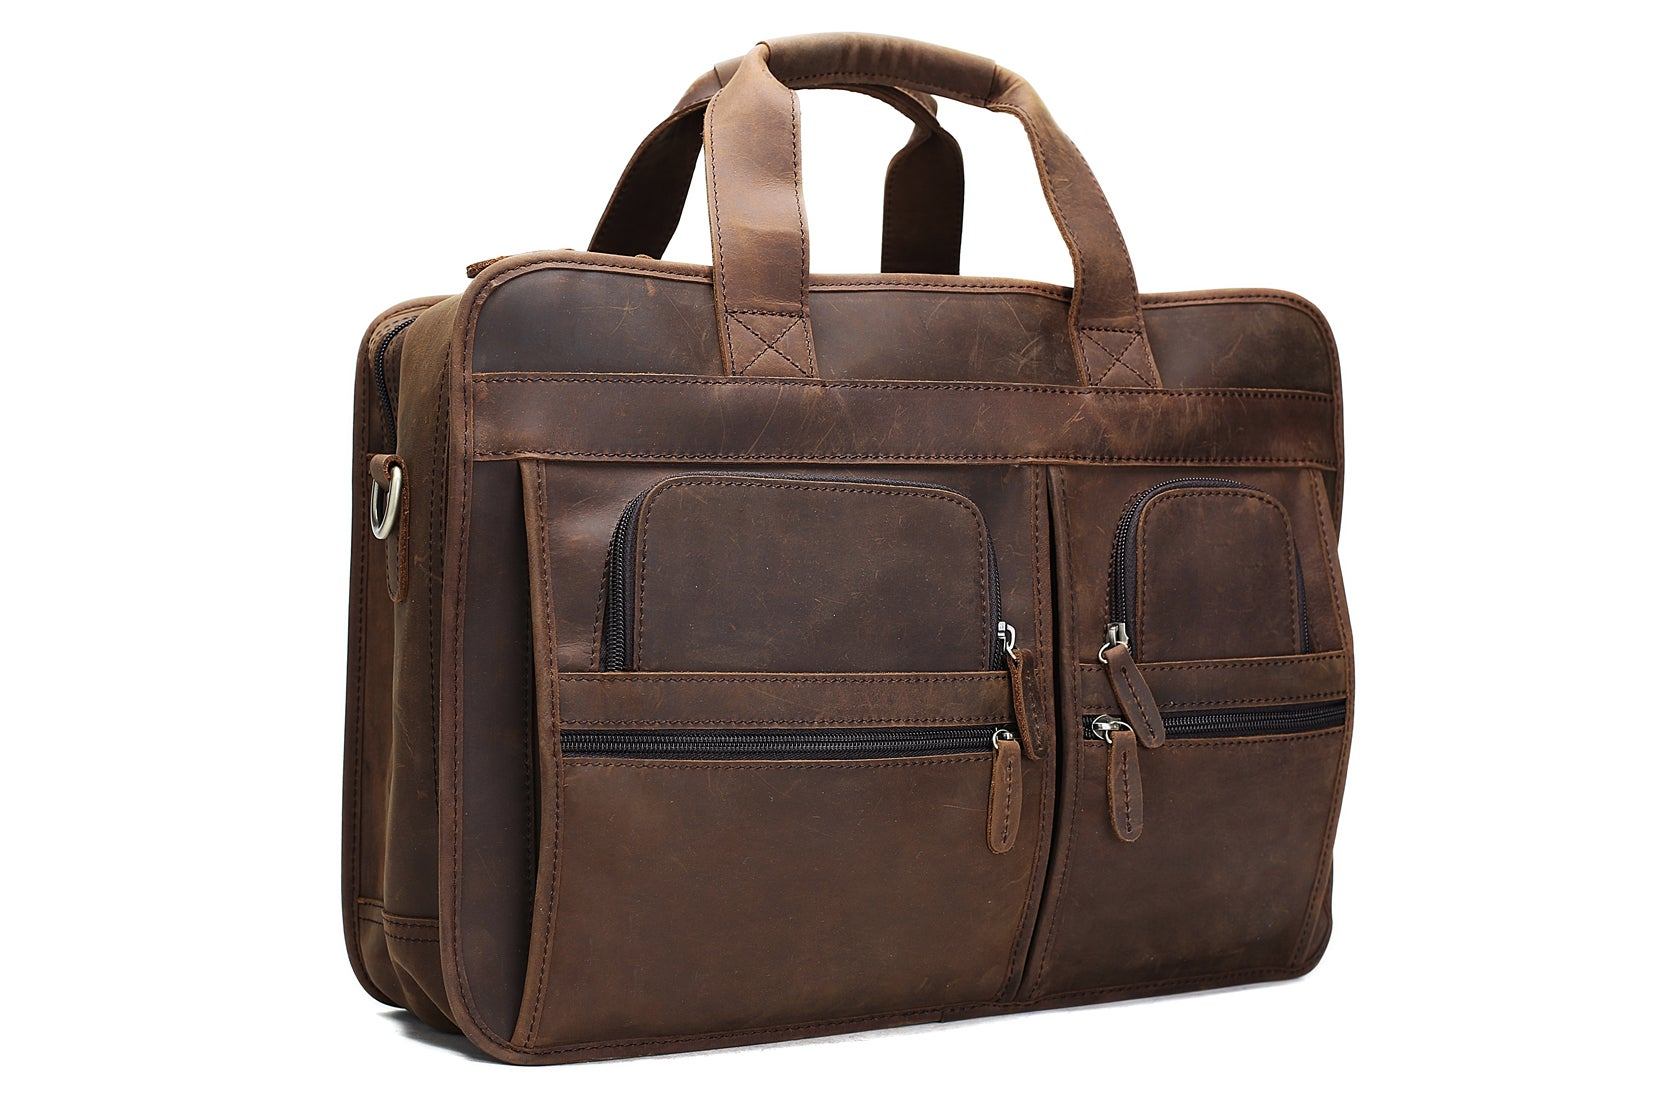 Handmade Genuine Leather Luggage Bag Travel Laptop Briefcase Dz11